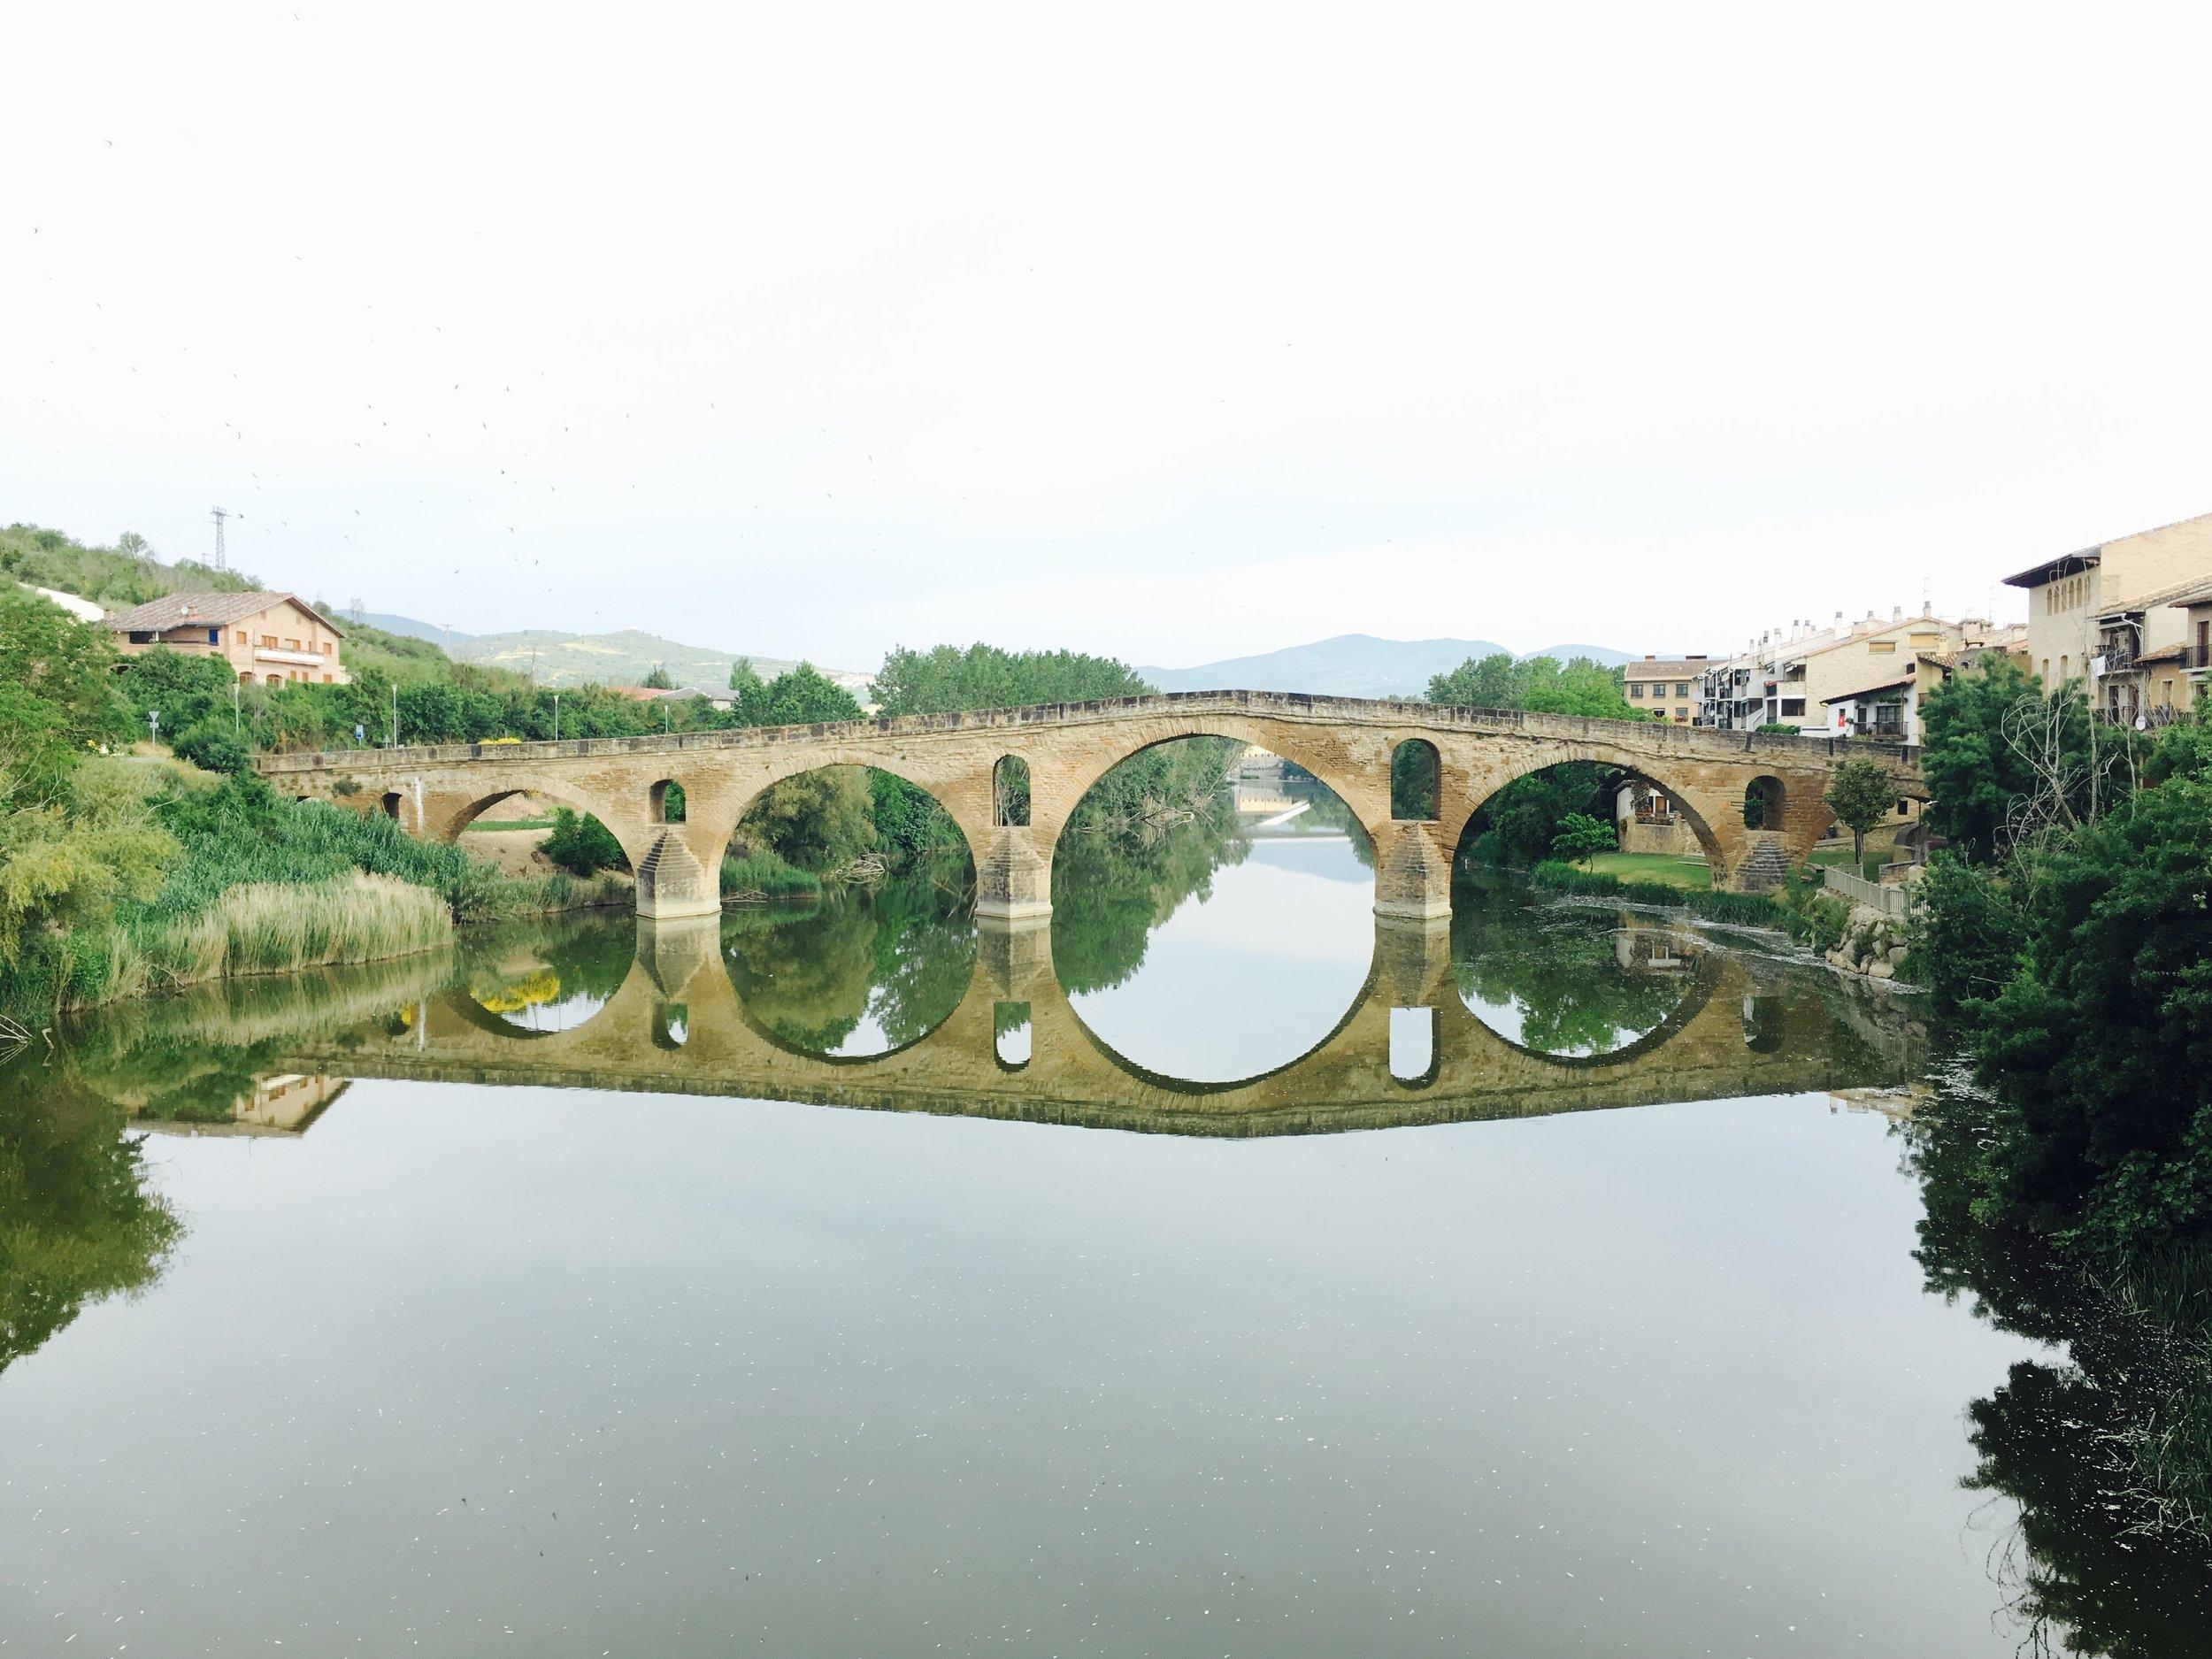 Camino_Day 4.jpg